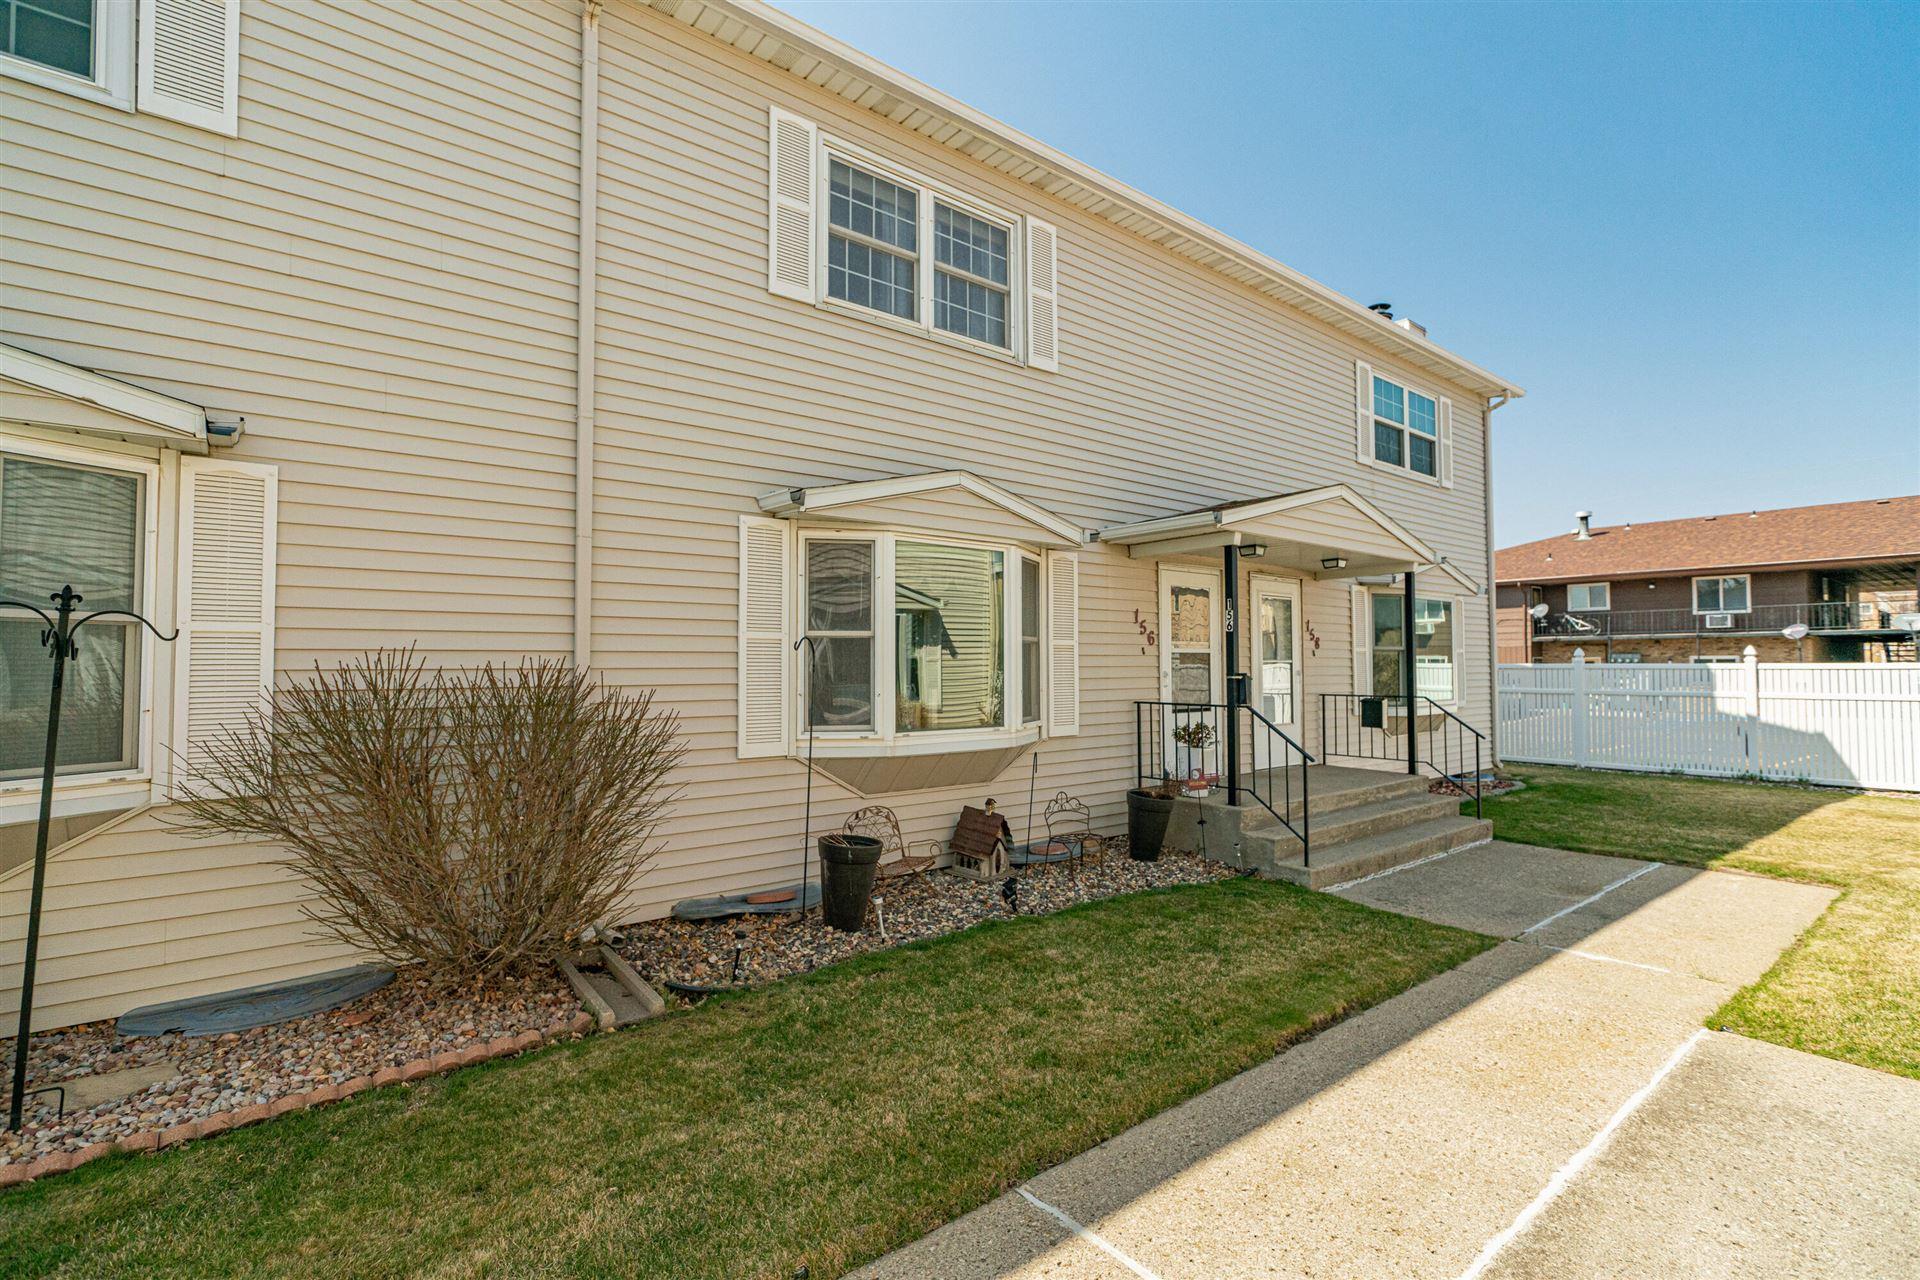 156 Boise Avenue, Bismarck, ND 58504 - #: 410556